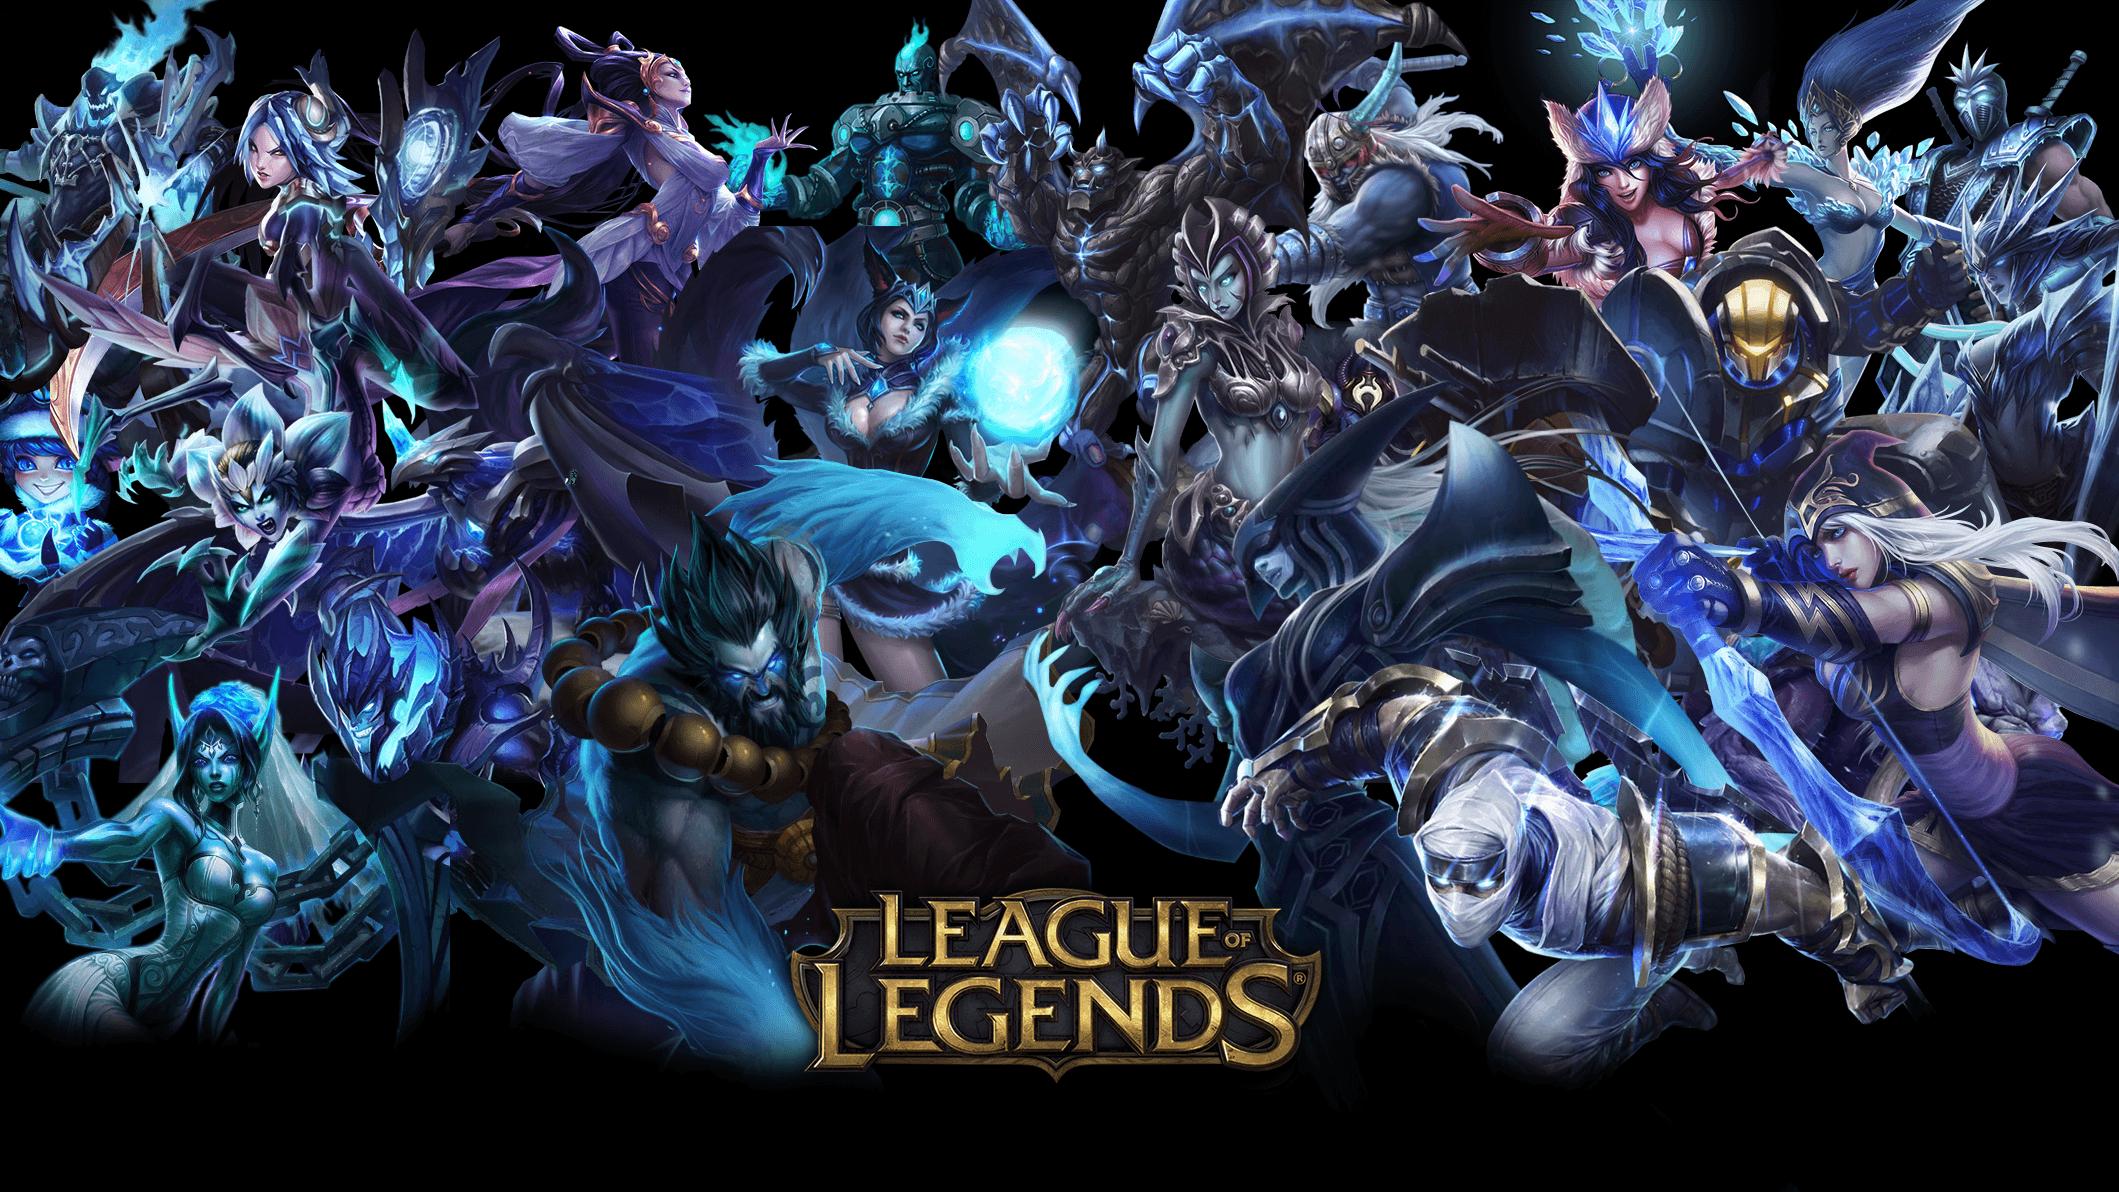 League Of Legends Desktop Wallpapers Top Free League Of Legends